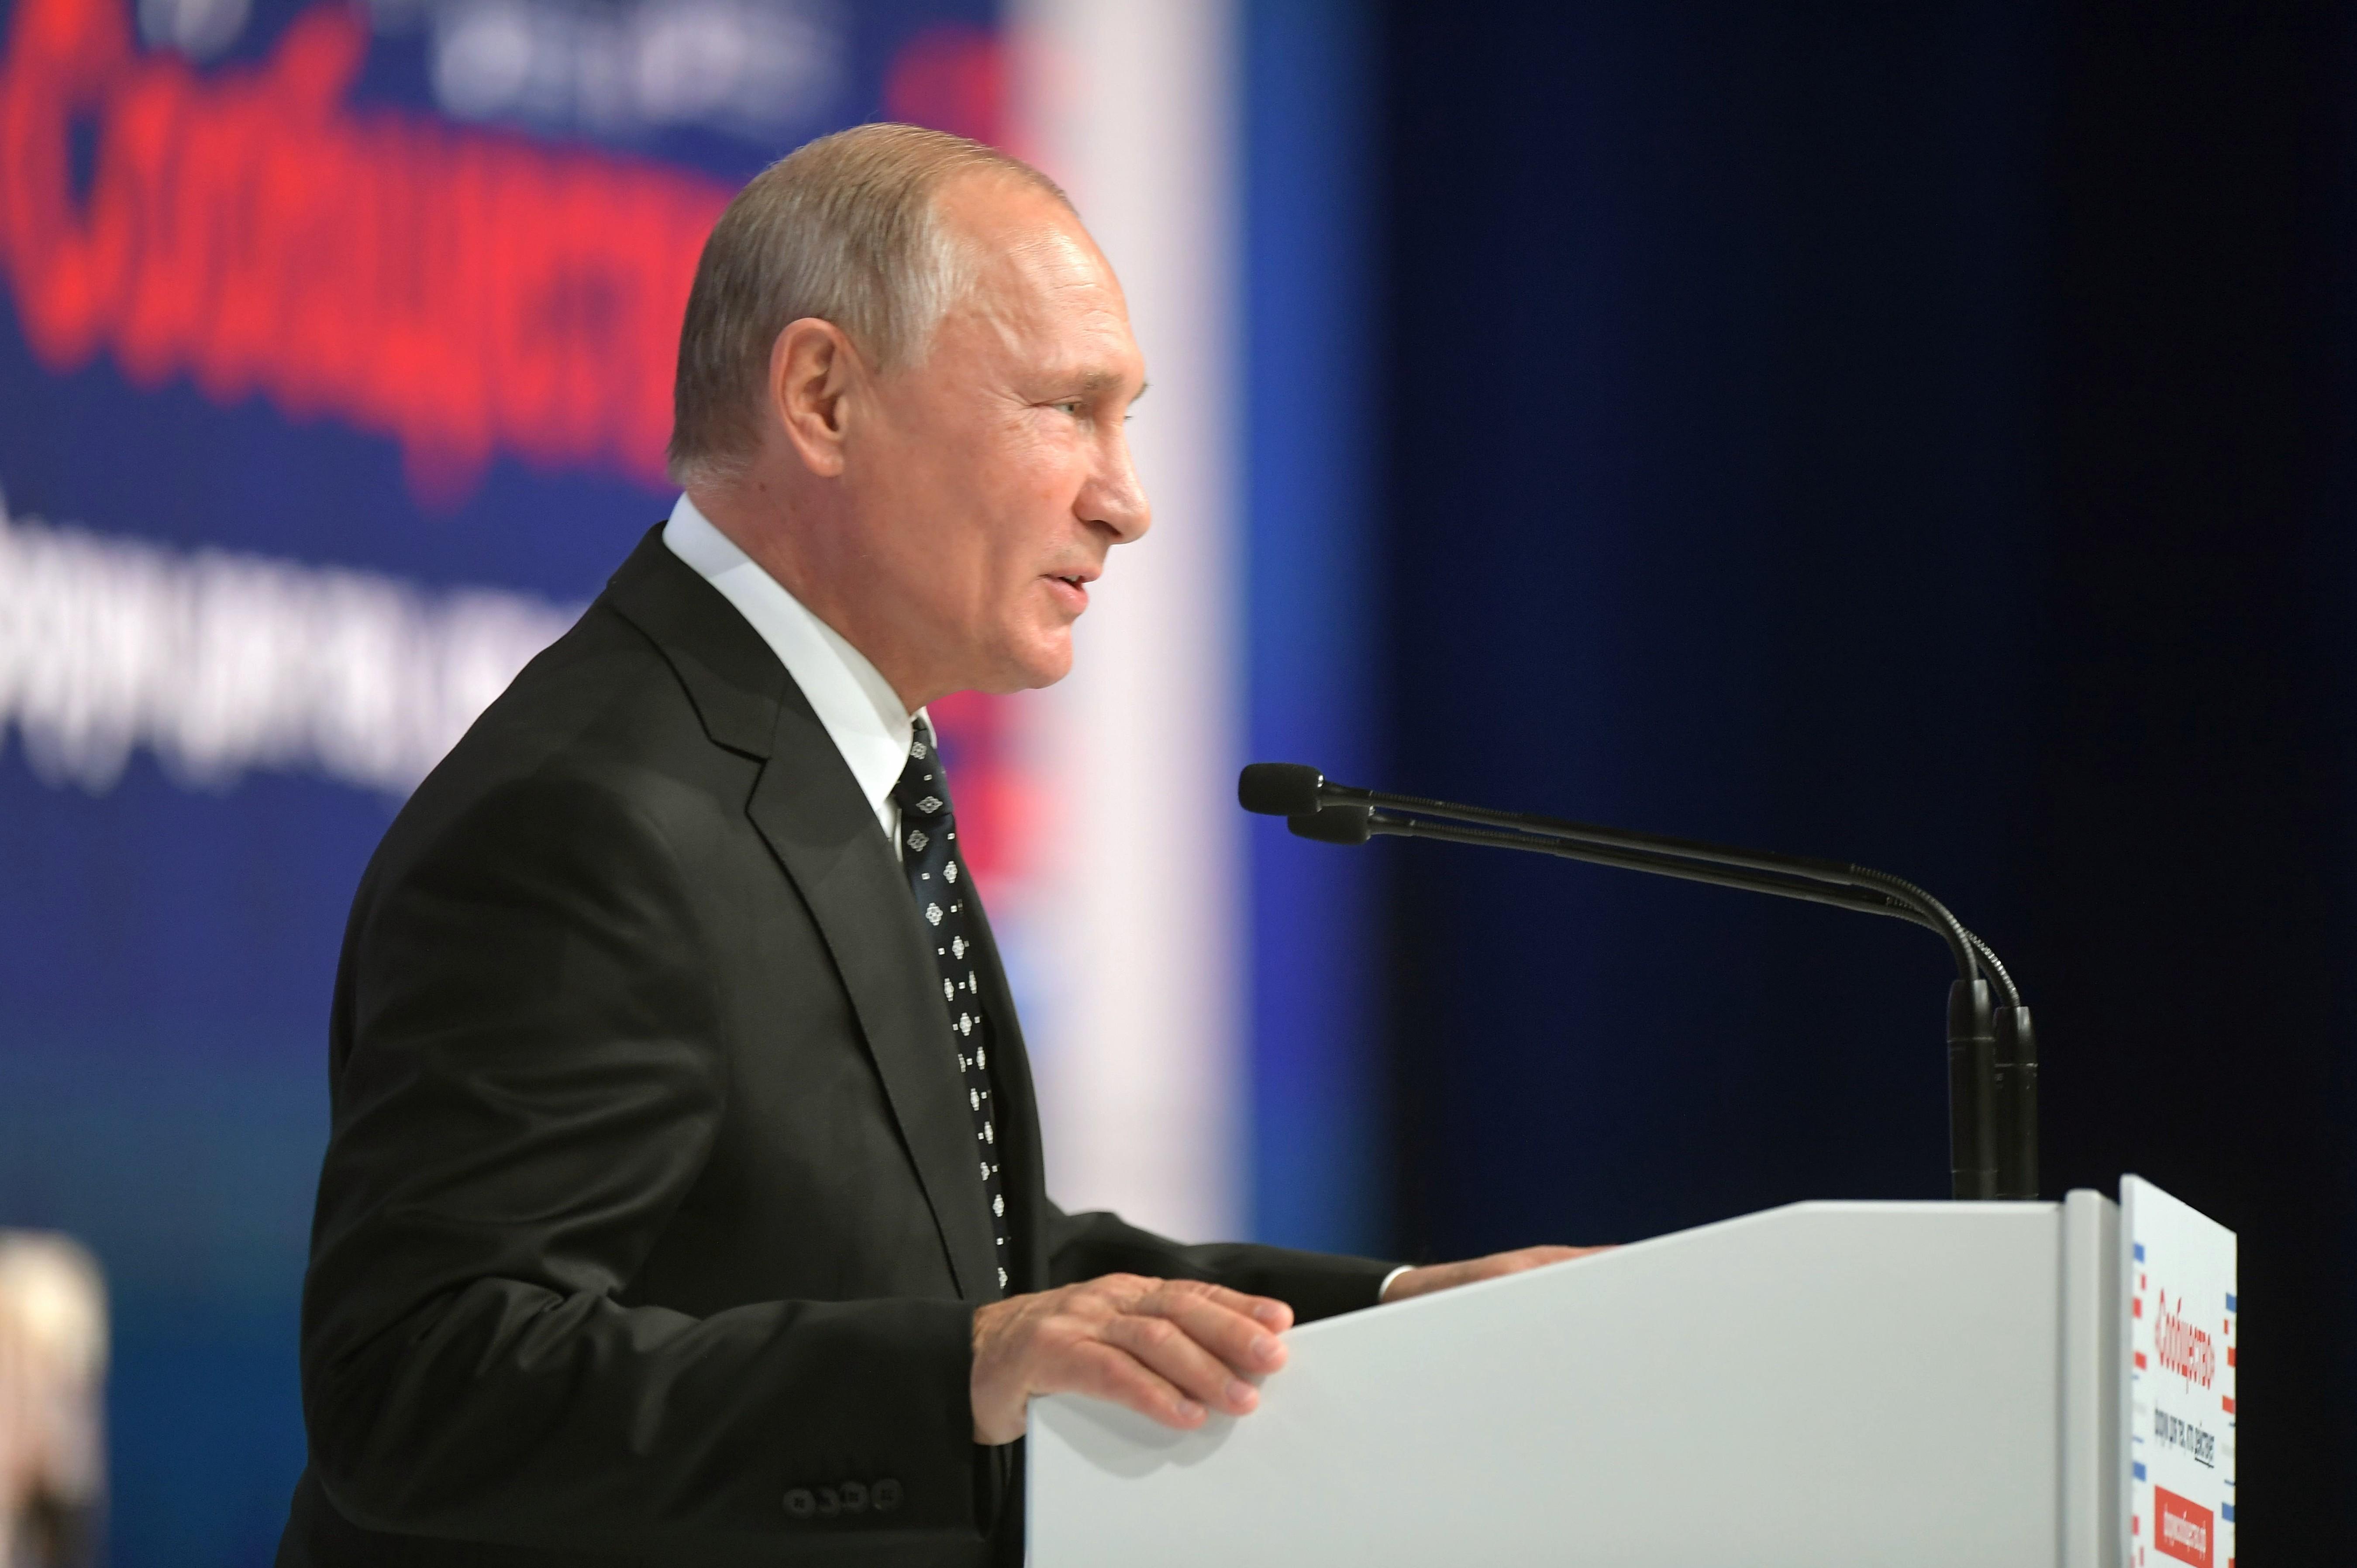 <p>Фото: &copy; РИА Новости / Сергей Гунеев</p>